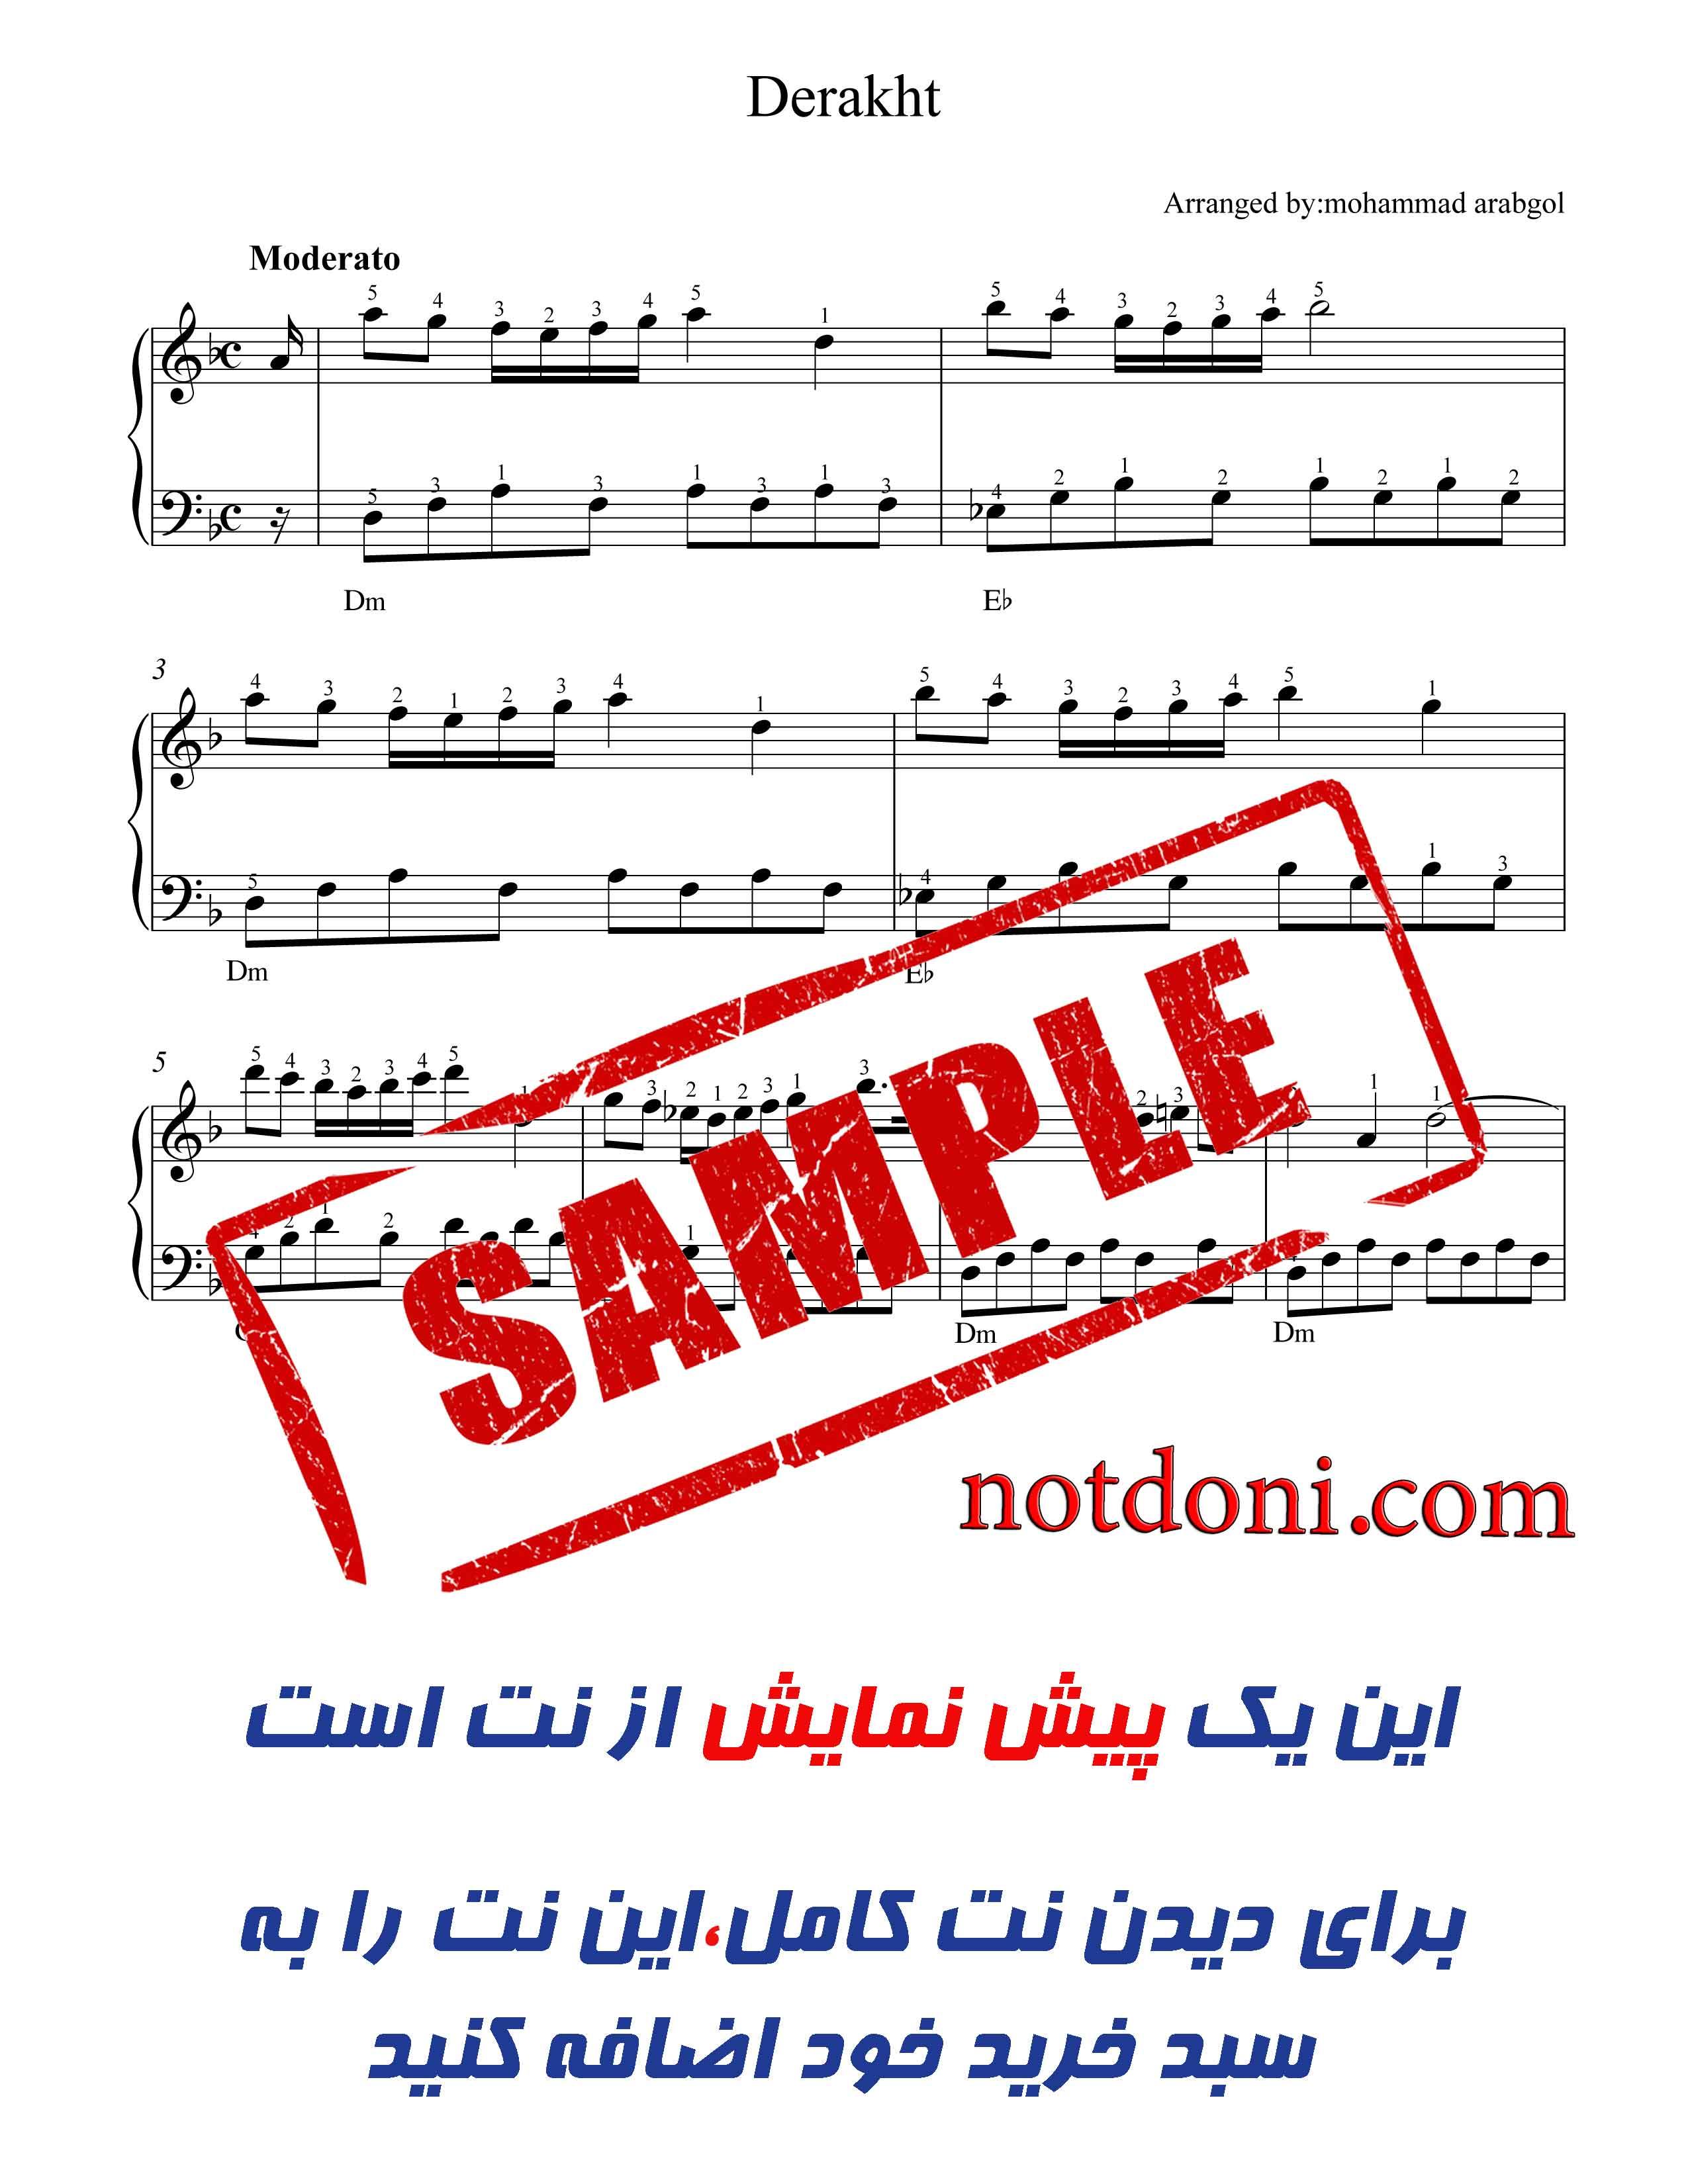 f9a16ad0-2e6e-4660-b1ce-3b463c6212ec_نت-آهنگ.jpg